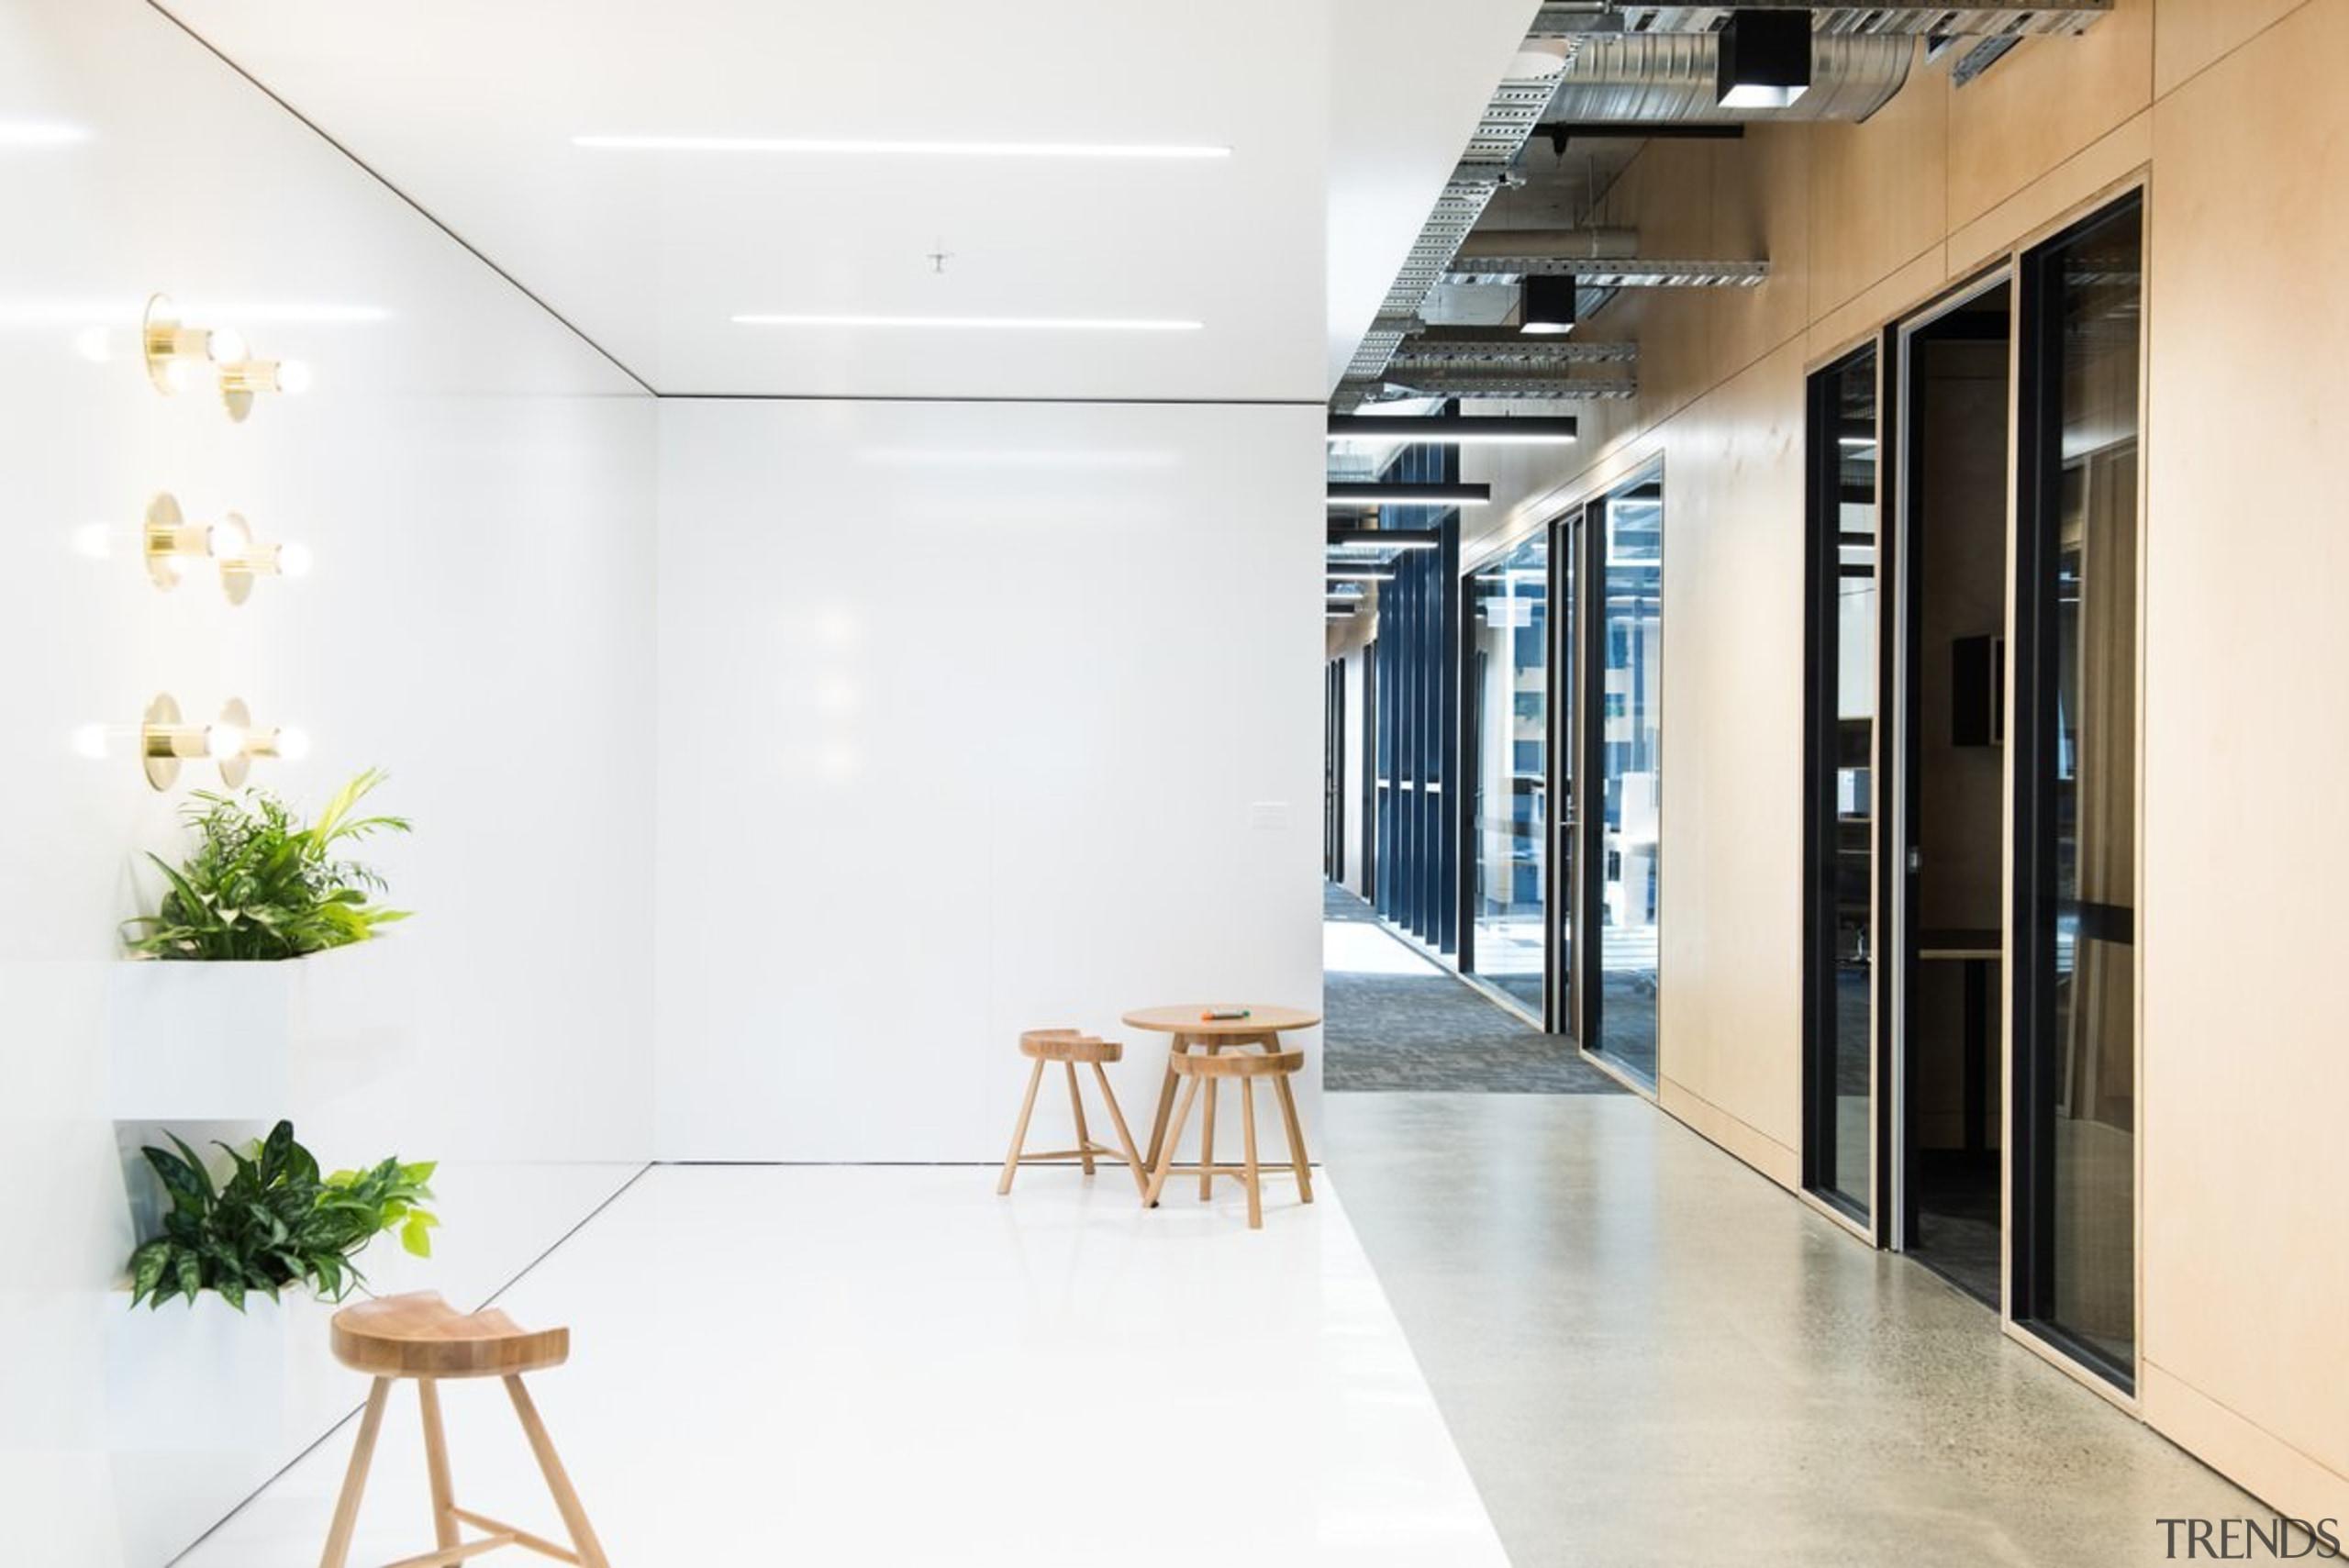 Designed by: Siren Design GroupPhotography by Cheyne architecture, floor, flooring, interior design, lobby, product design, white